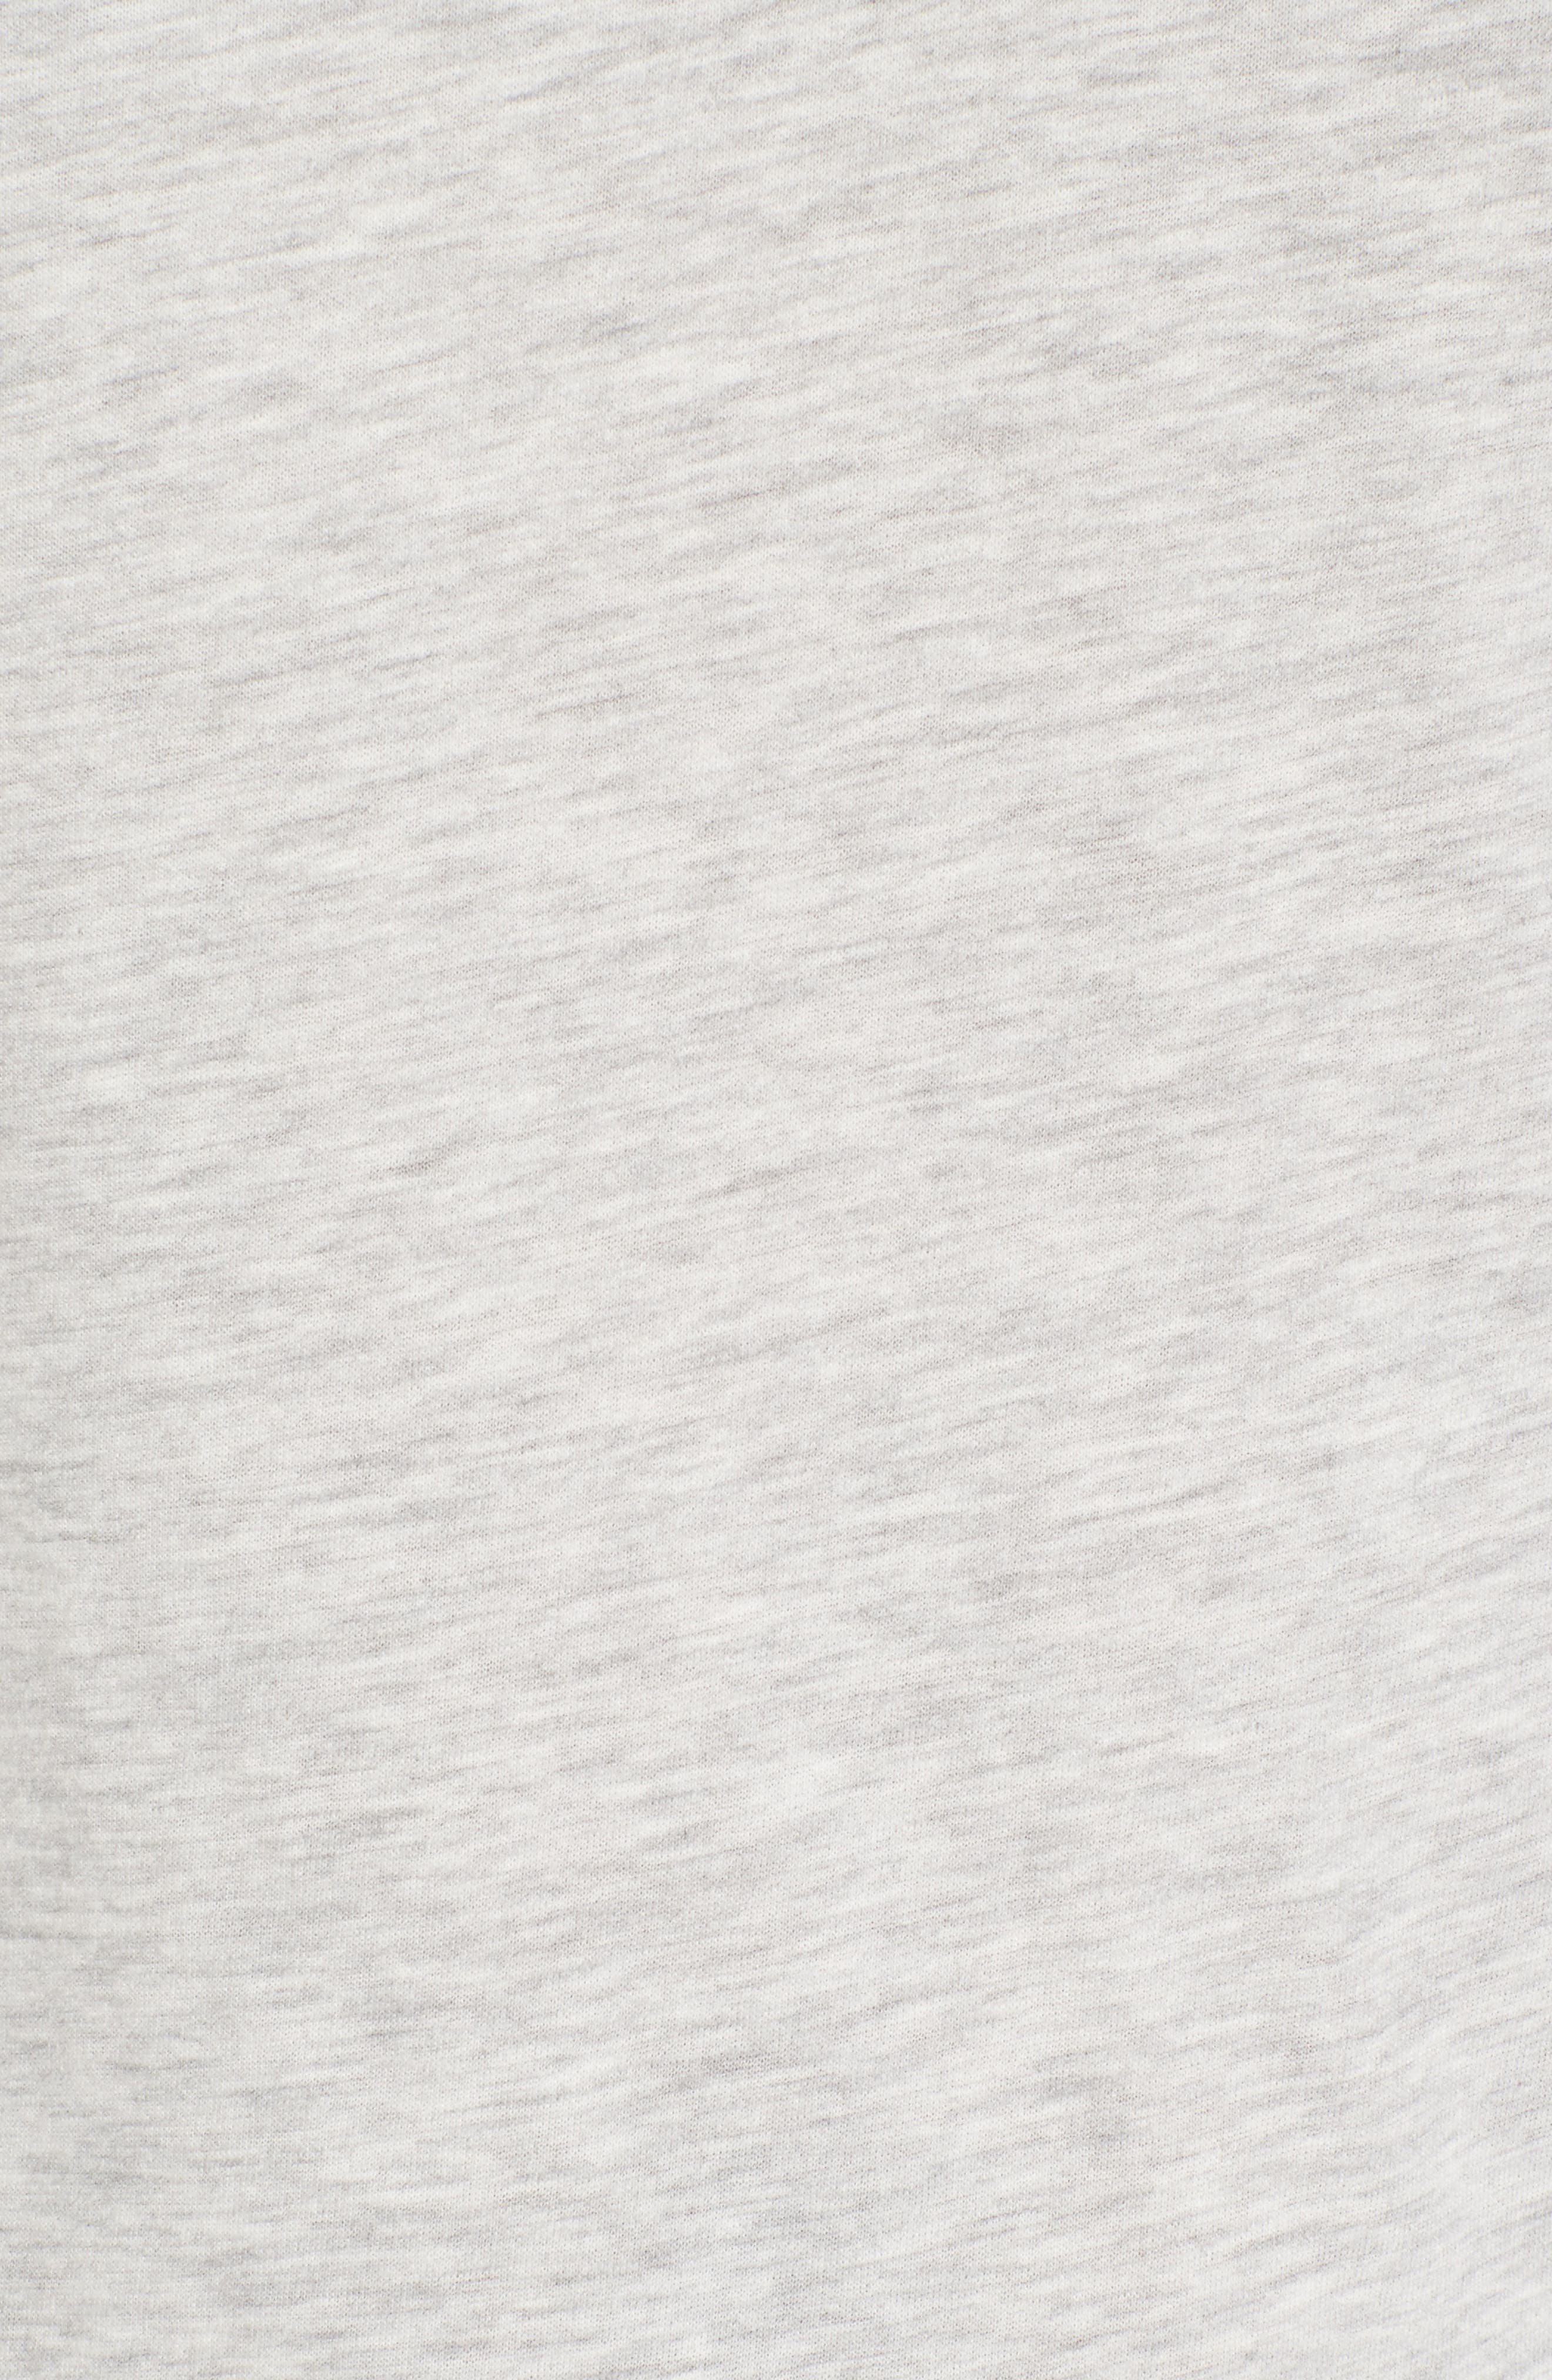 Club Nomade Soft Granddad T-Shirt,                             Alternate thumbnail 5, color,                             020